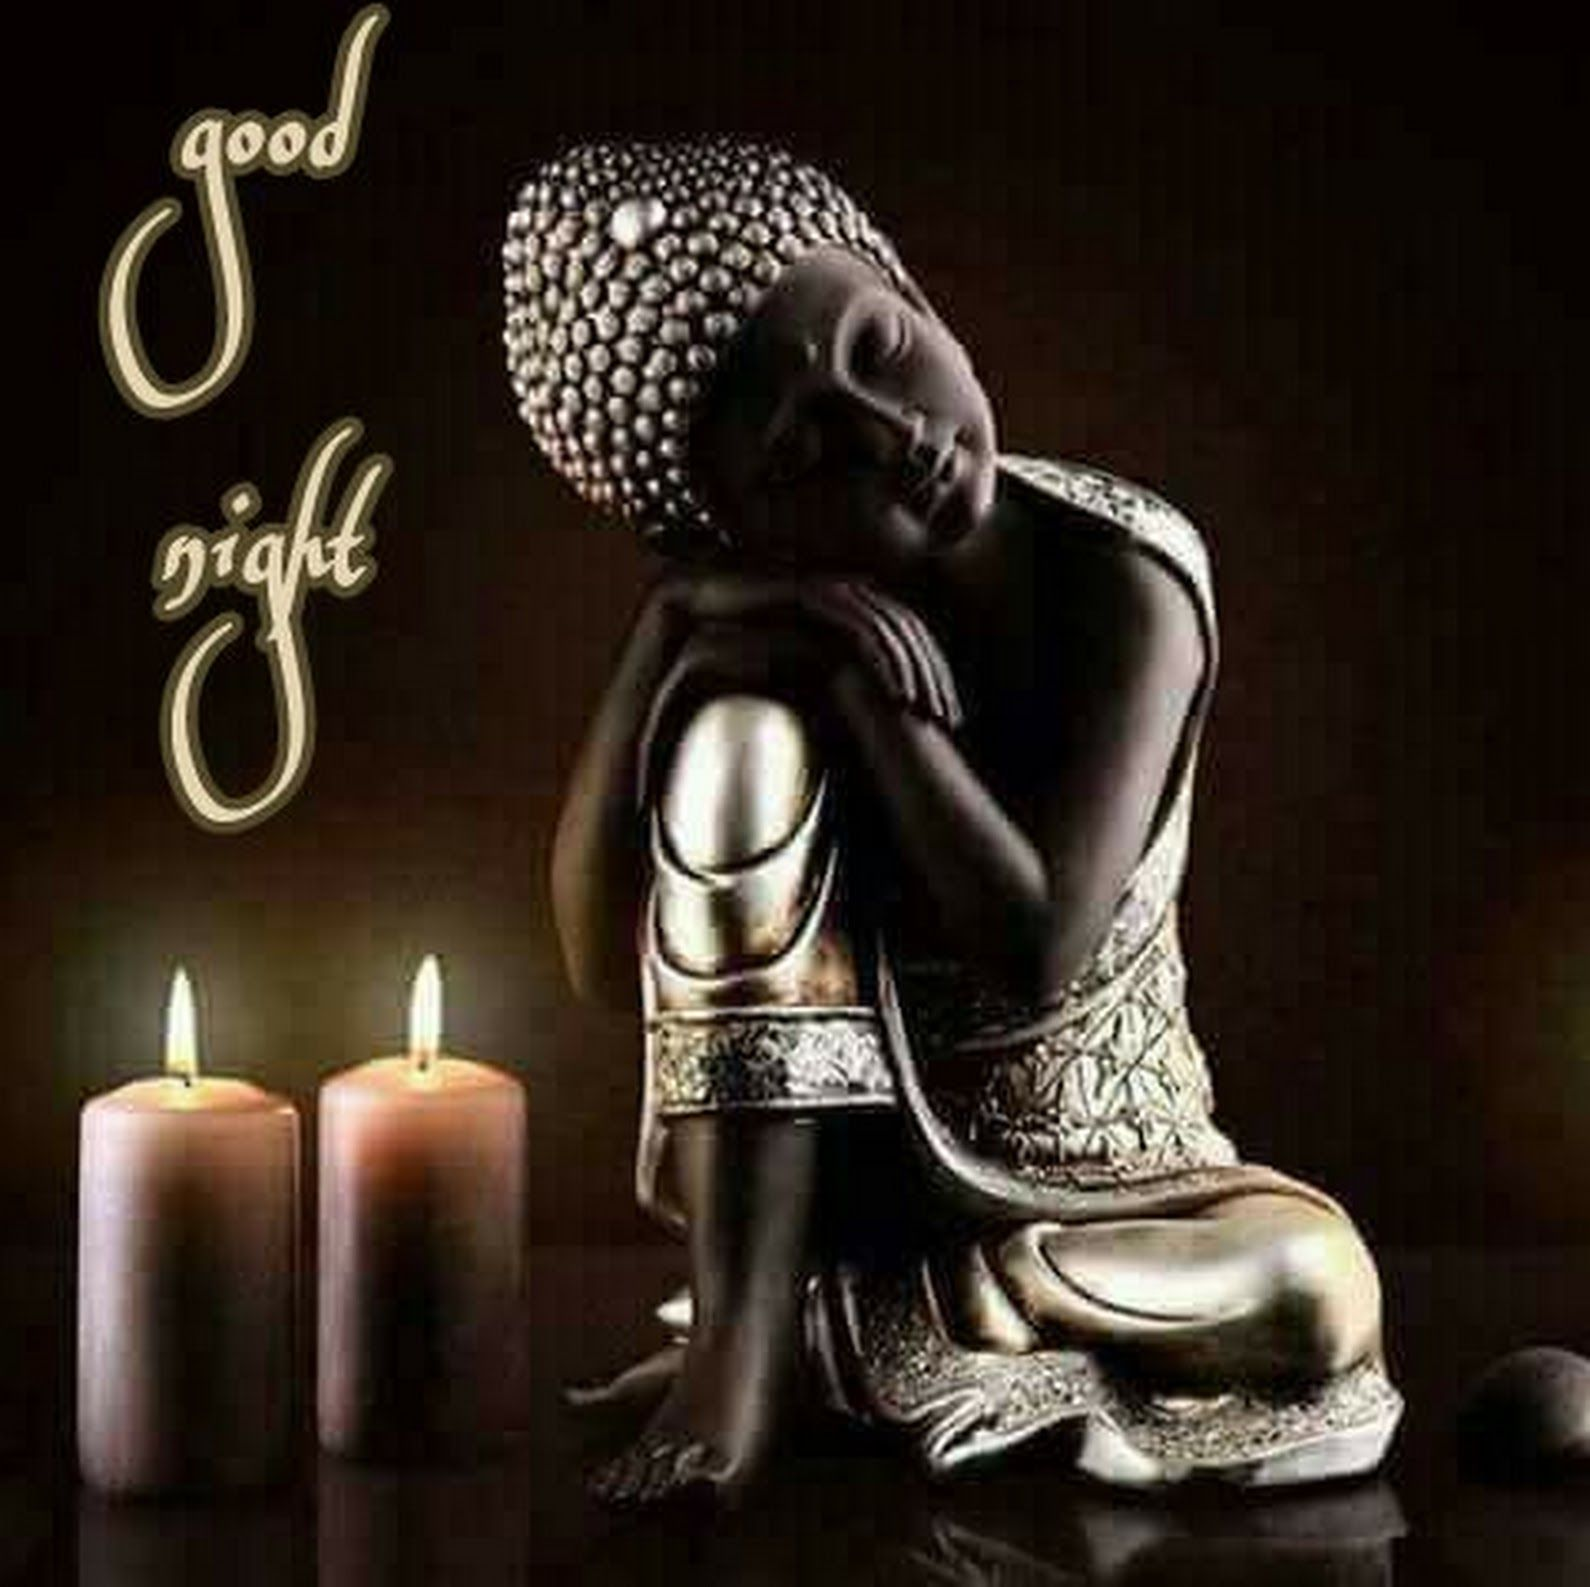 Sign in | Gud night images, Good night dear, Good night dear friend